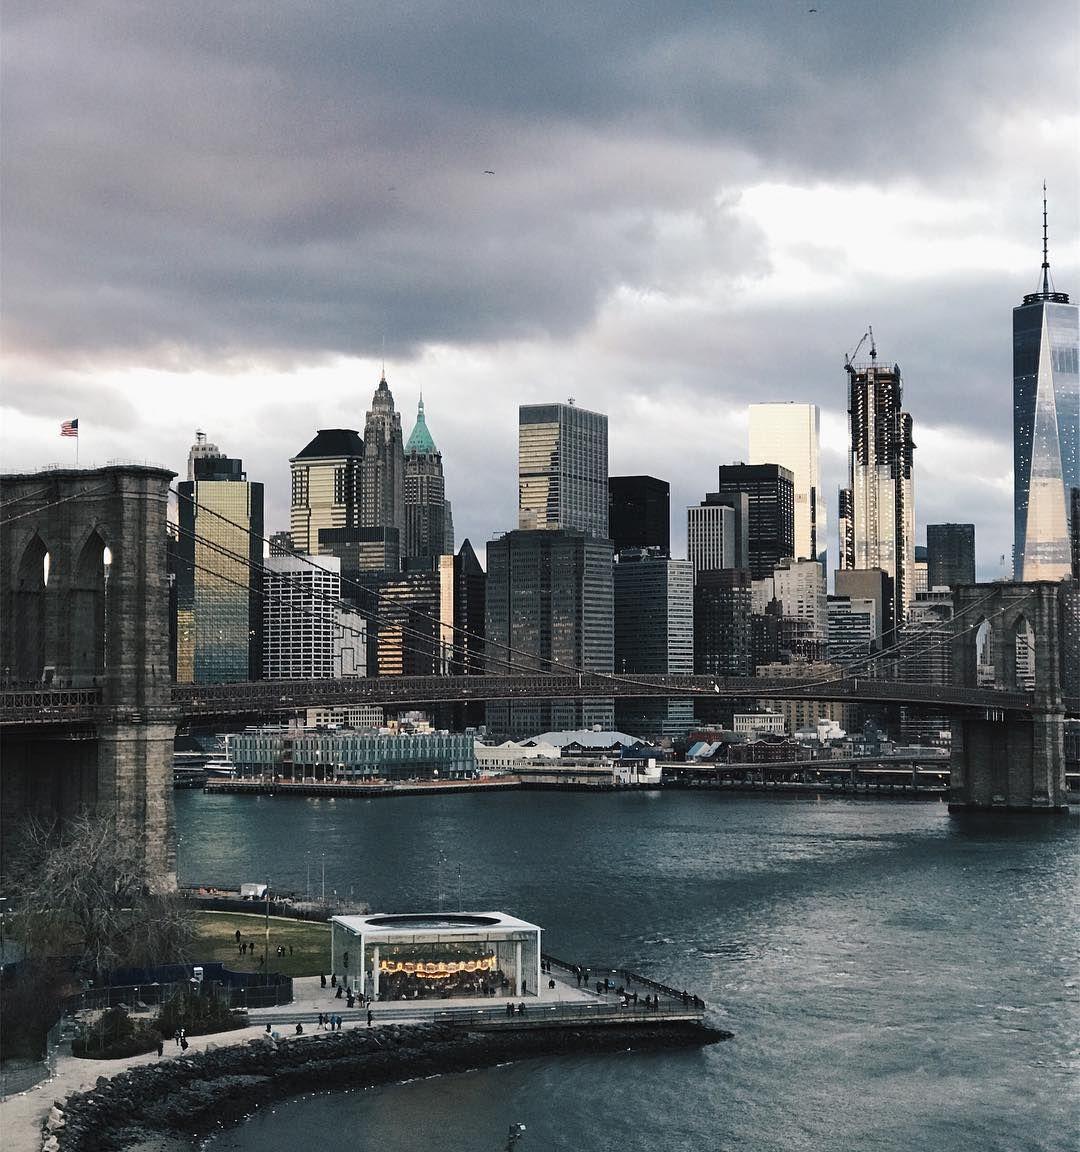 A beautiful snow storm brewing over the city. ❄️  Brooklyn Bridge Park